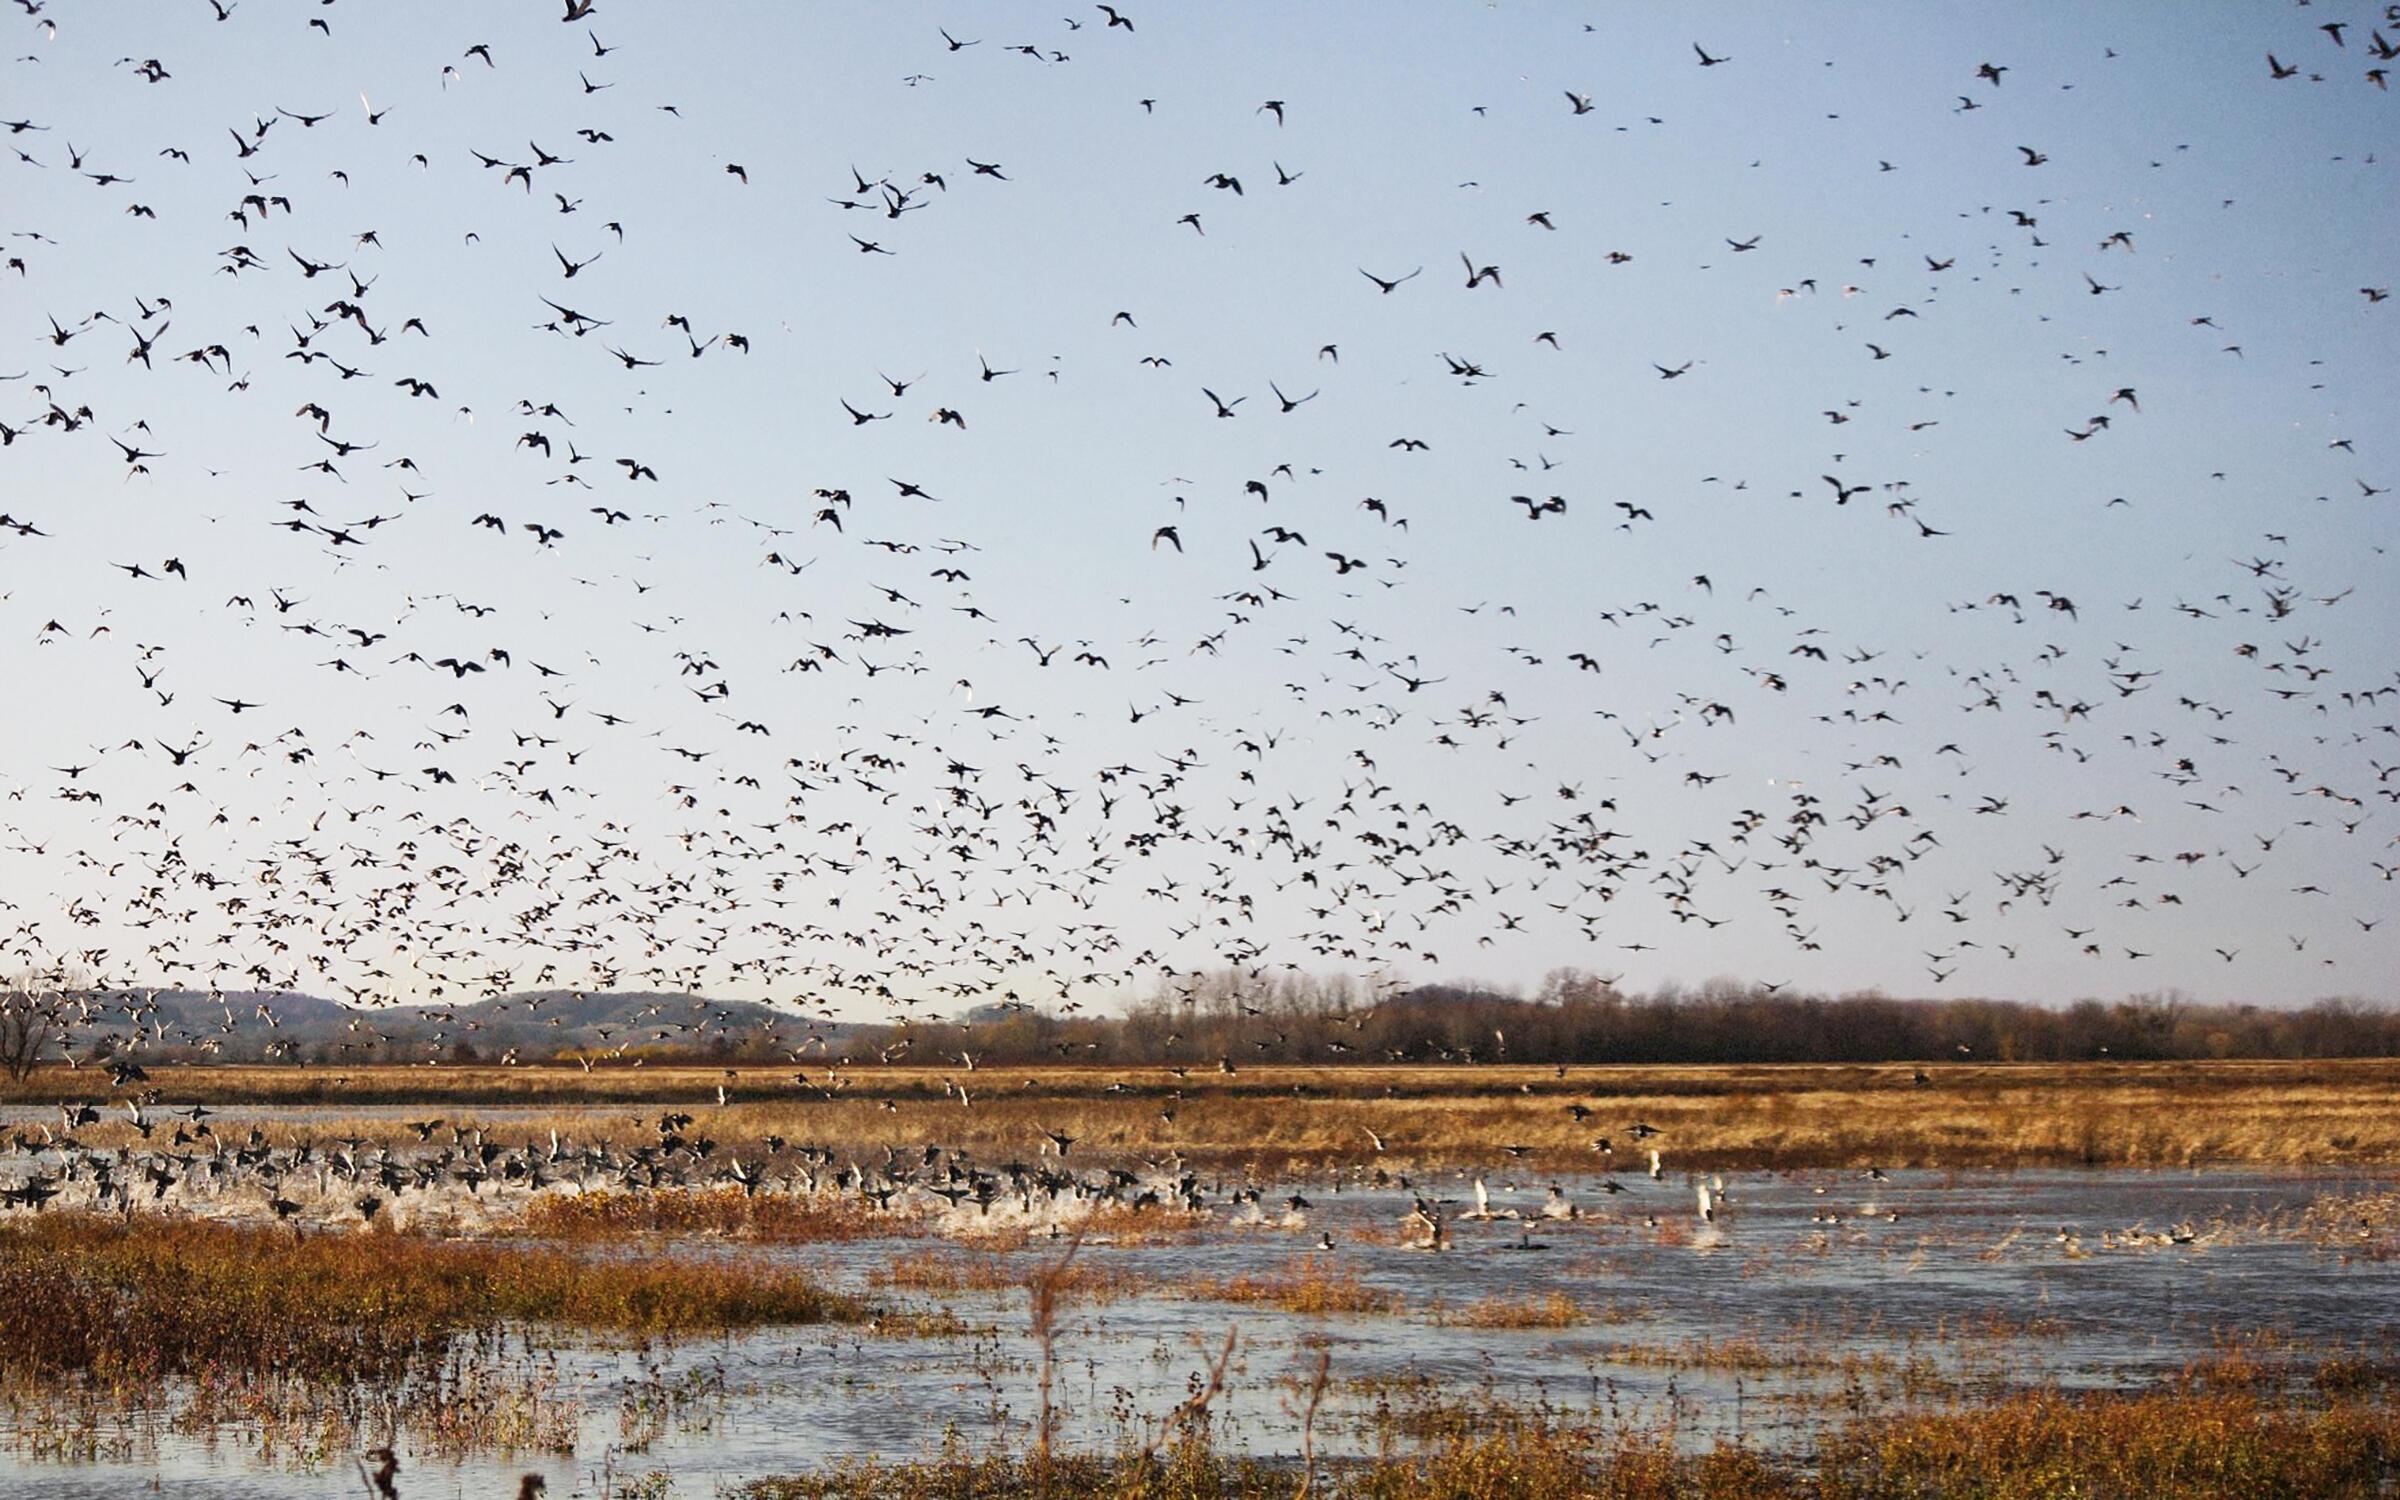 Fall migration at Clarence Cannon National Wildlife Refuge, Missouri. USFWS